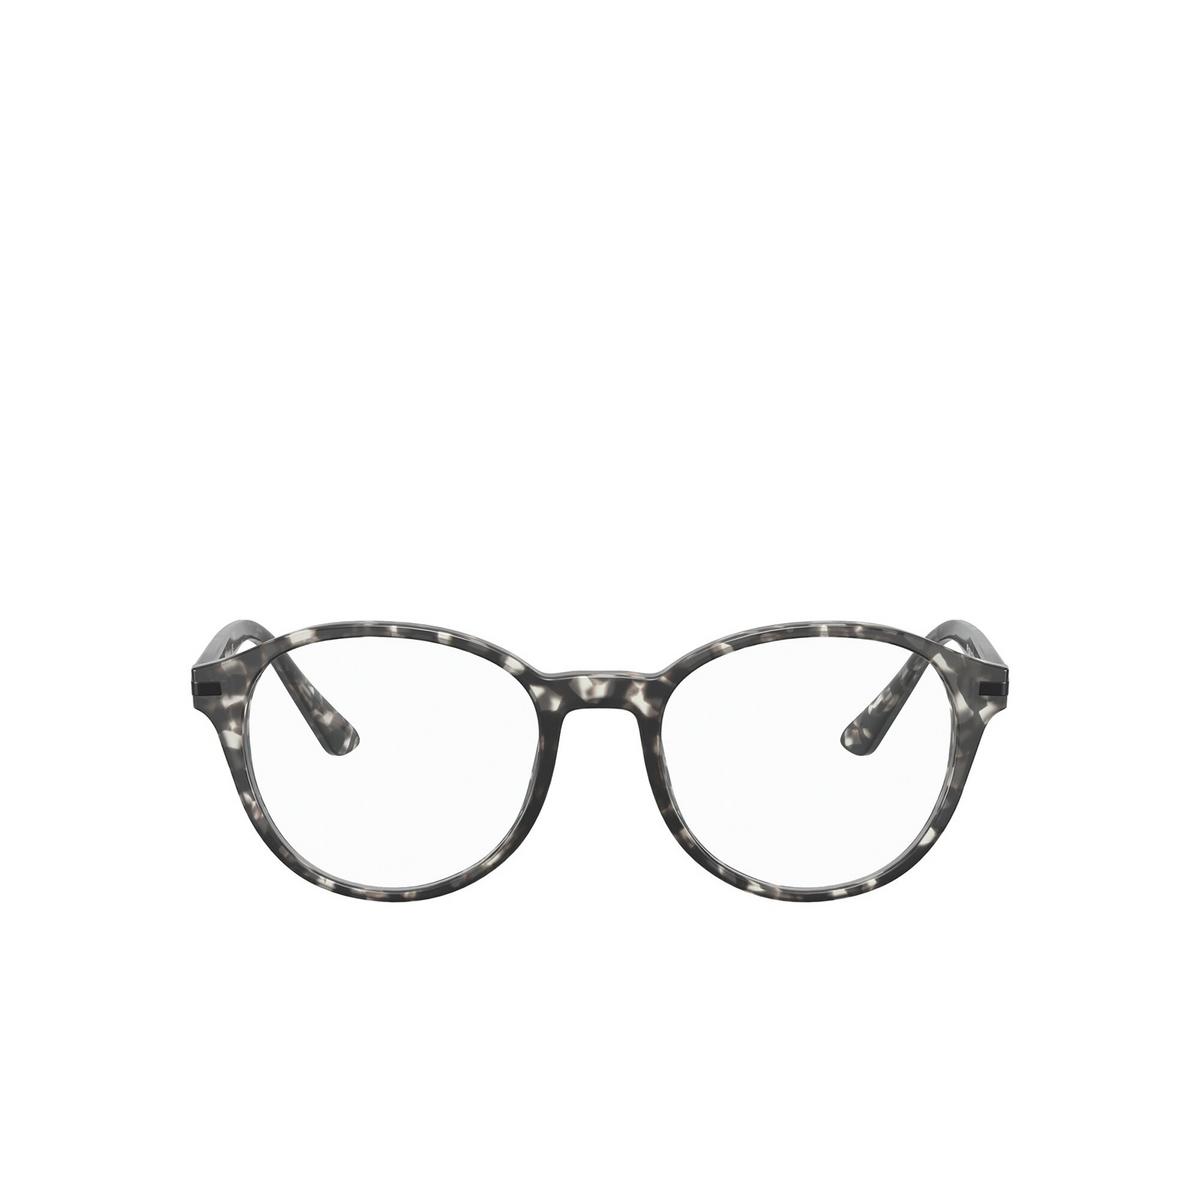 Prada® Round Eyeglasses: PR 13WV color Matte Grey Tortoise VH31O1 - front view.